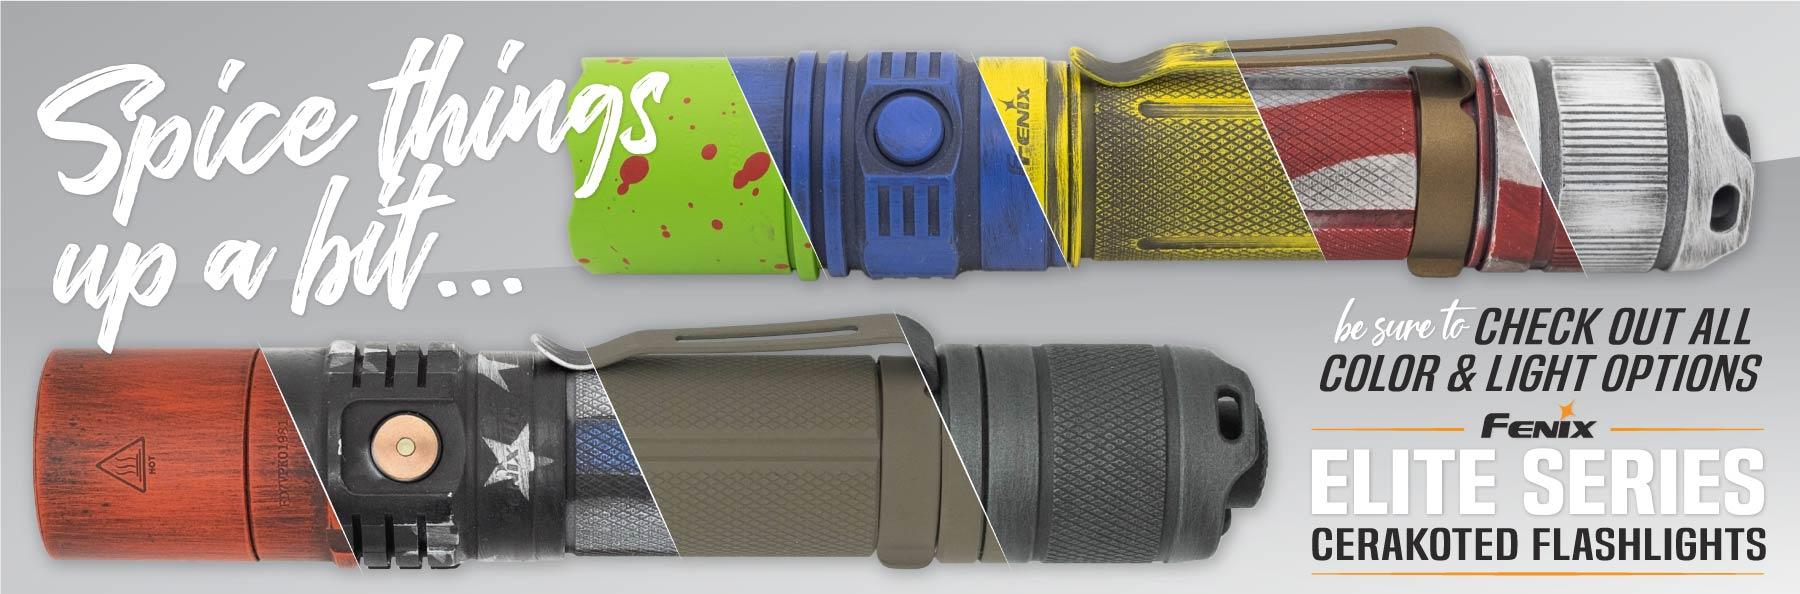 Fenix Patriot Design Flashlights